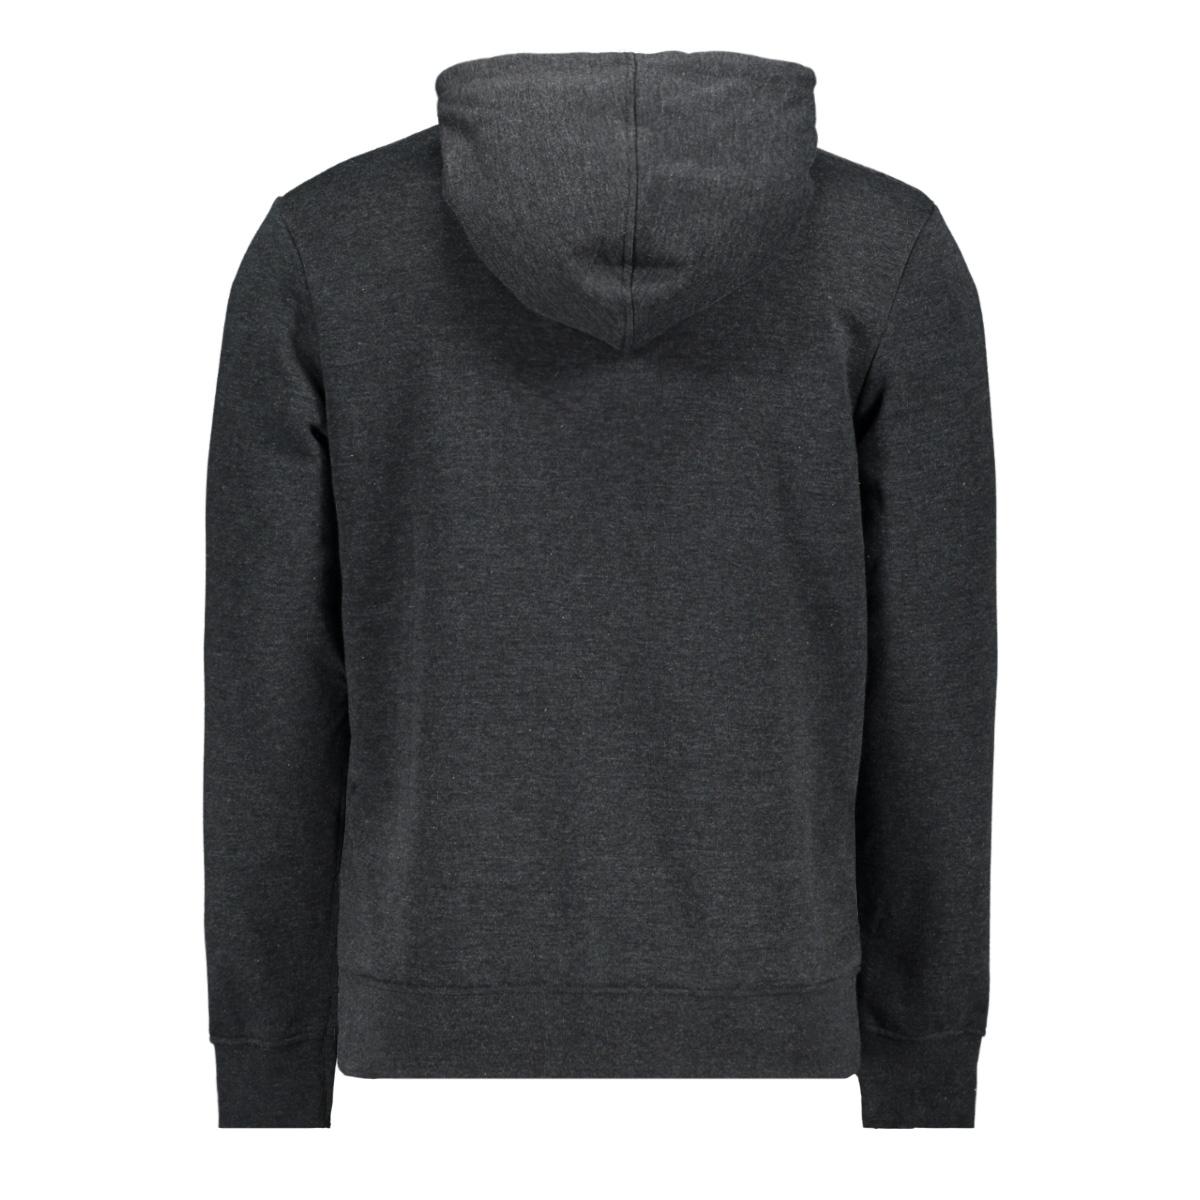 jcomarlon sweat hood 12167582 jack & jones sweater black/melange